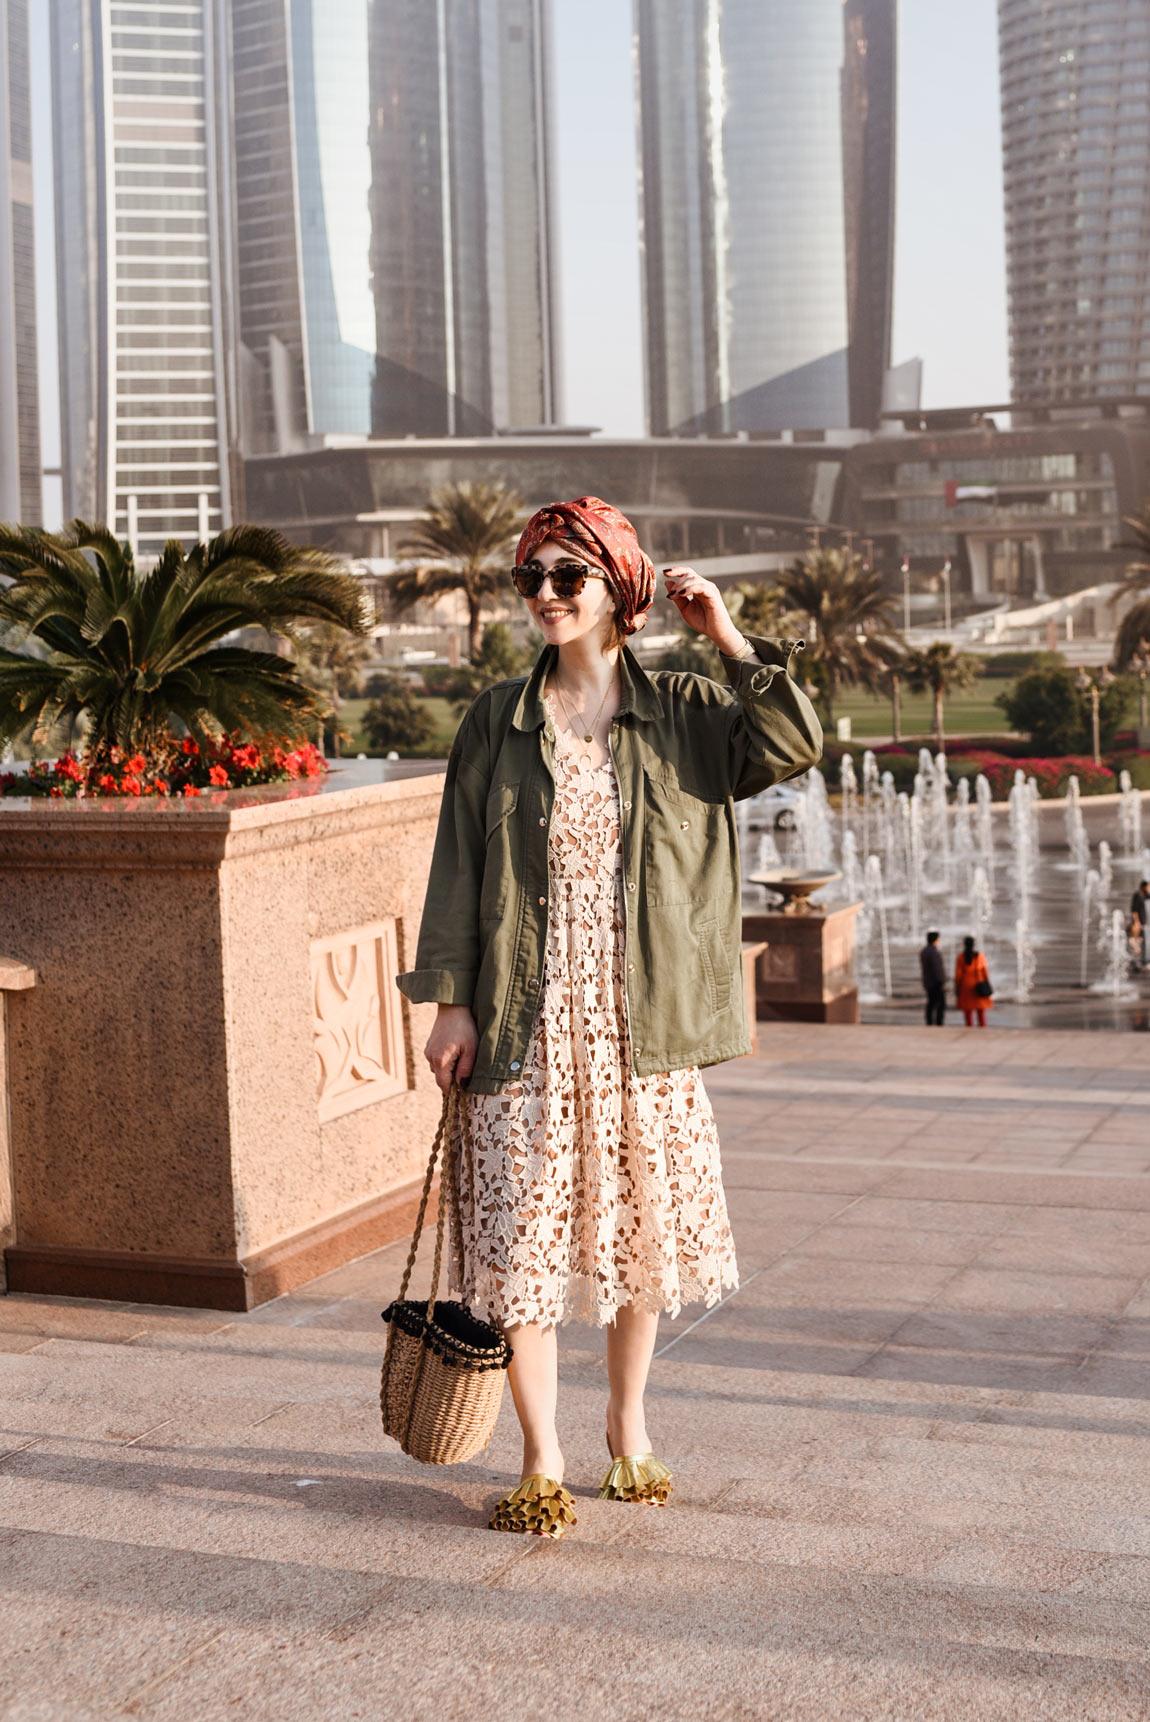 wüste, wueste, abu, dhabi, satc, vae, emirates, reise, travel, blog, blogger, münchen, fashionblogger, modeblogger, fotoshooting, sunset, sonnenuntergang, city, lifestyle